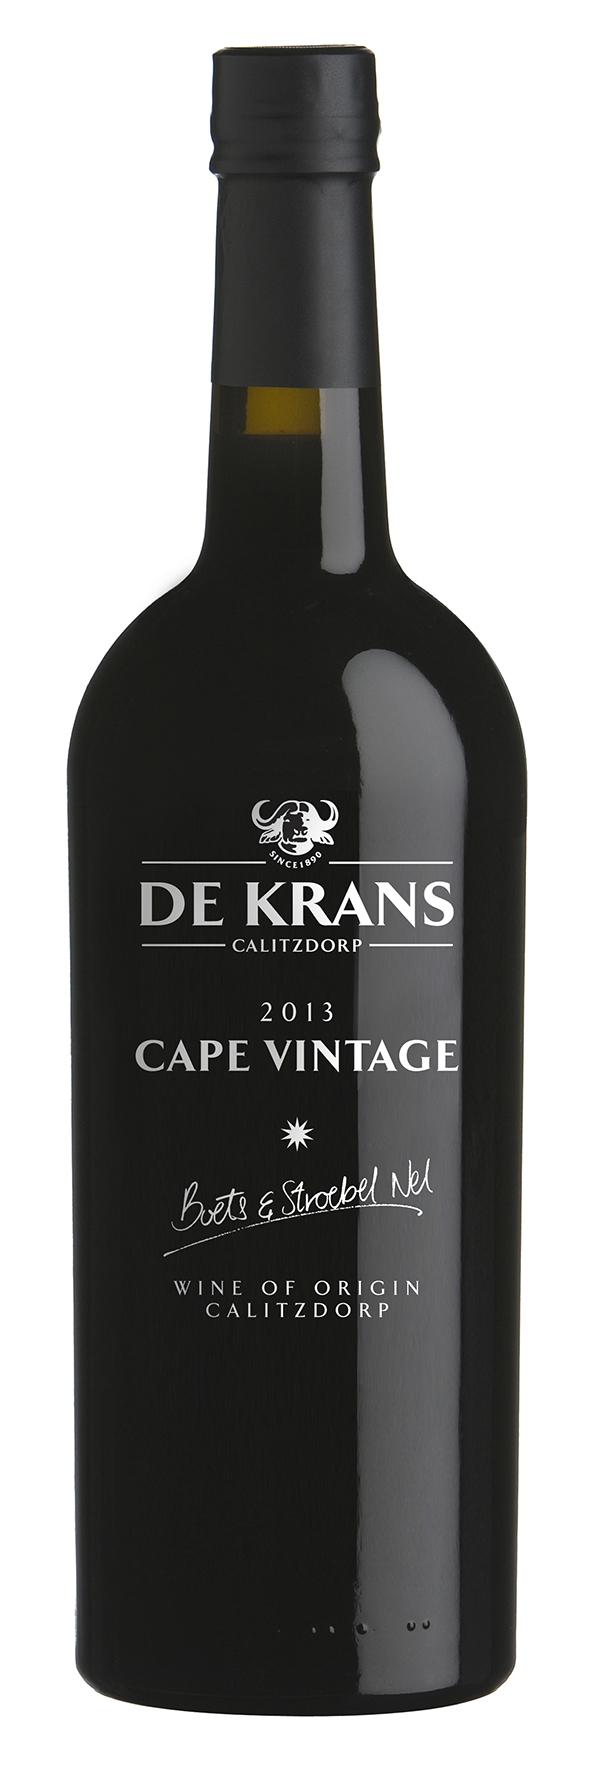 Cape Vintage 2013 pack